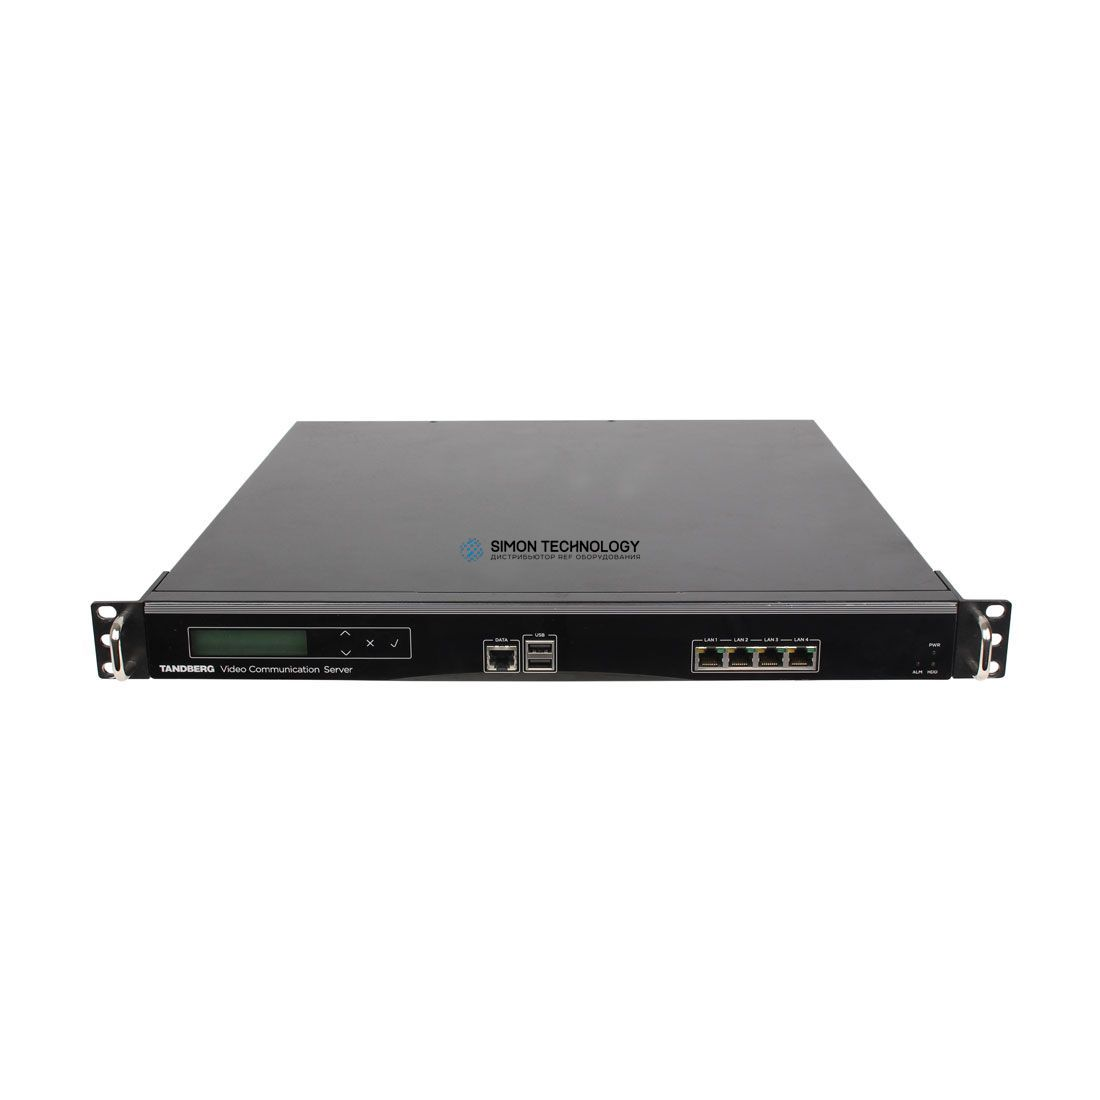 Cisco TANDBERG TELEPRESENCE VIDEO COMMUNICATION SERVER (TTC2-04)